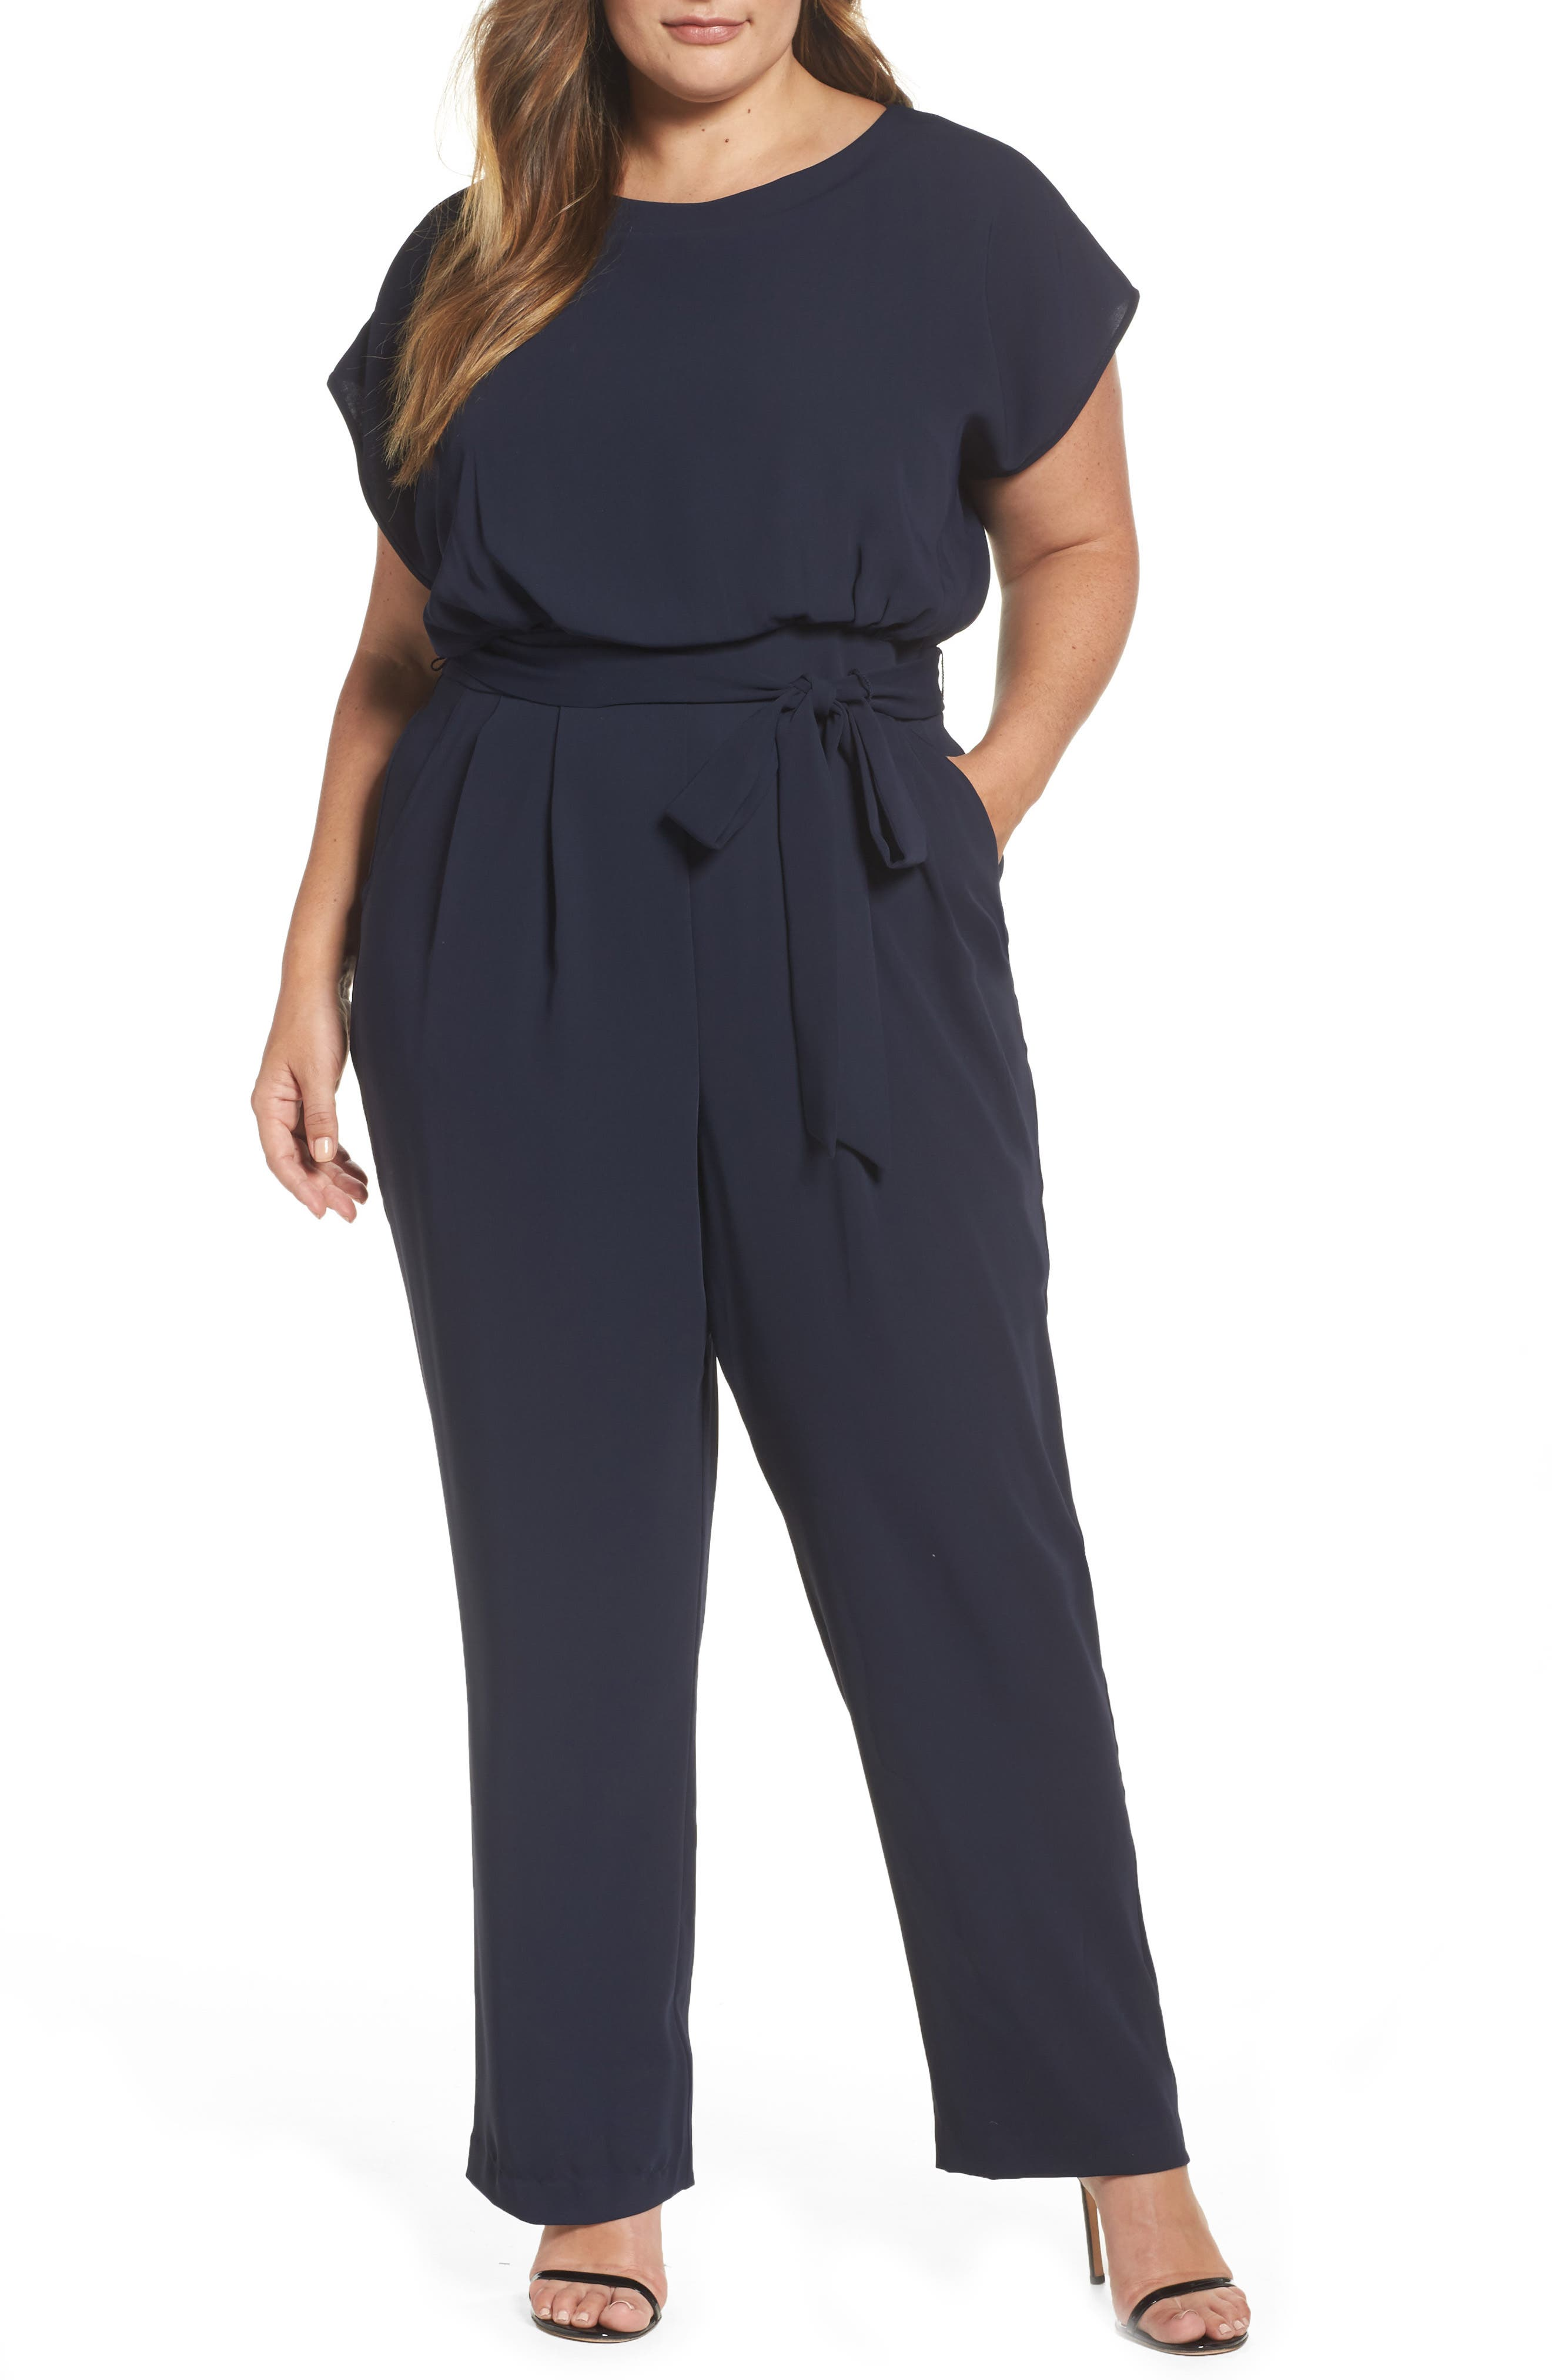 Alternate Image 1 Selected - Eliza J Cap Sleeve Crepe Jumpsuit (Plus Size)